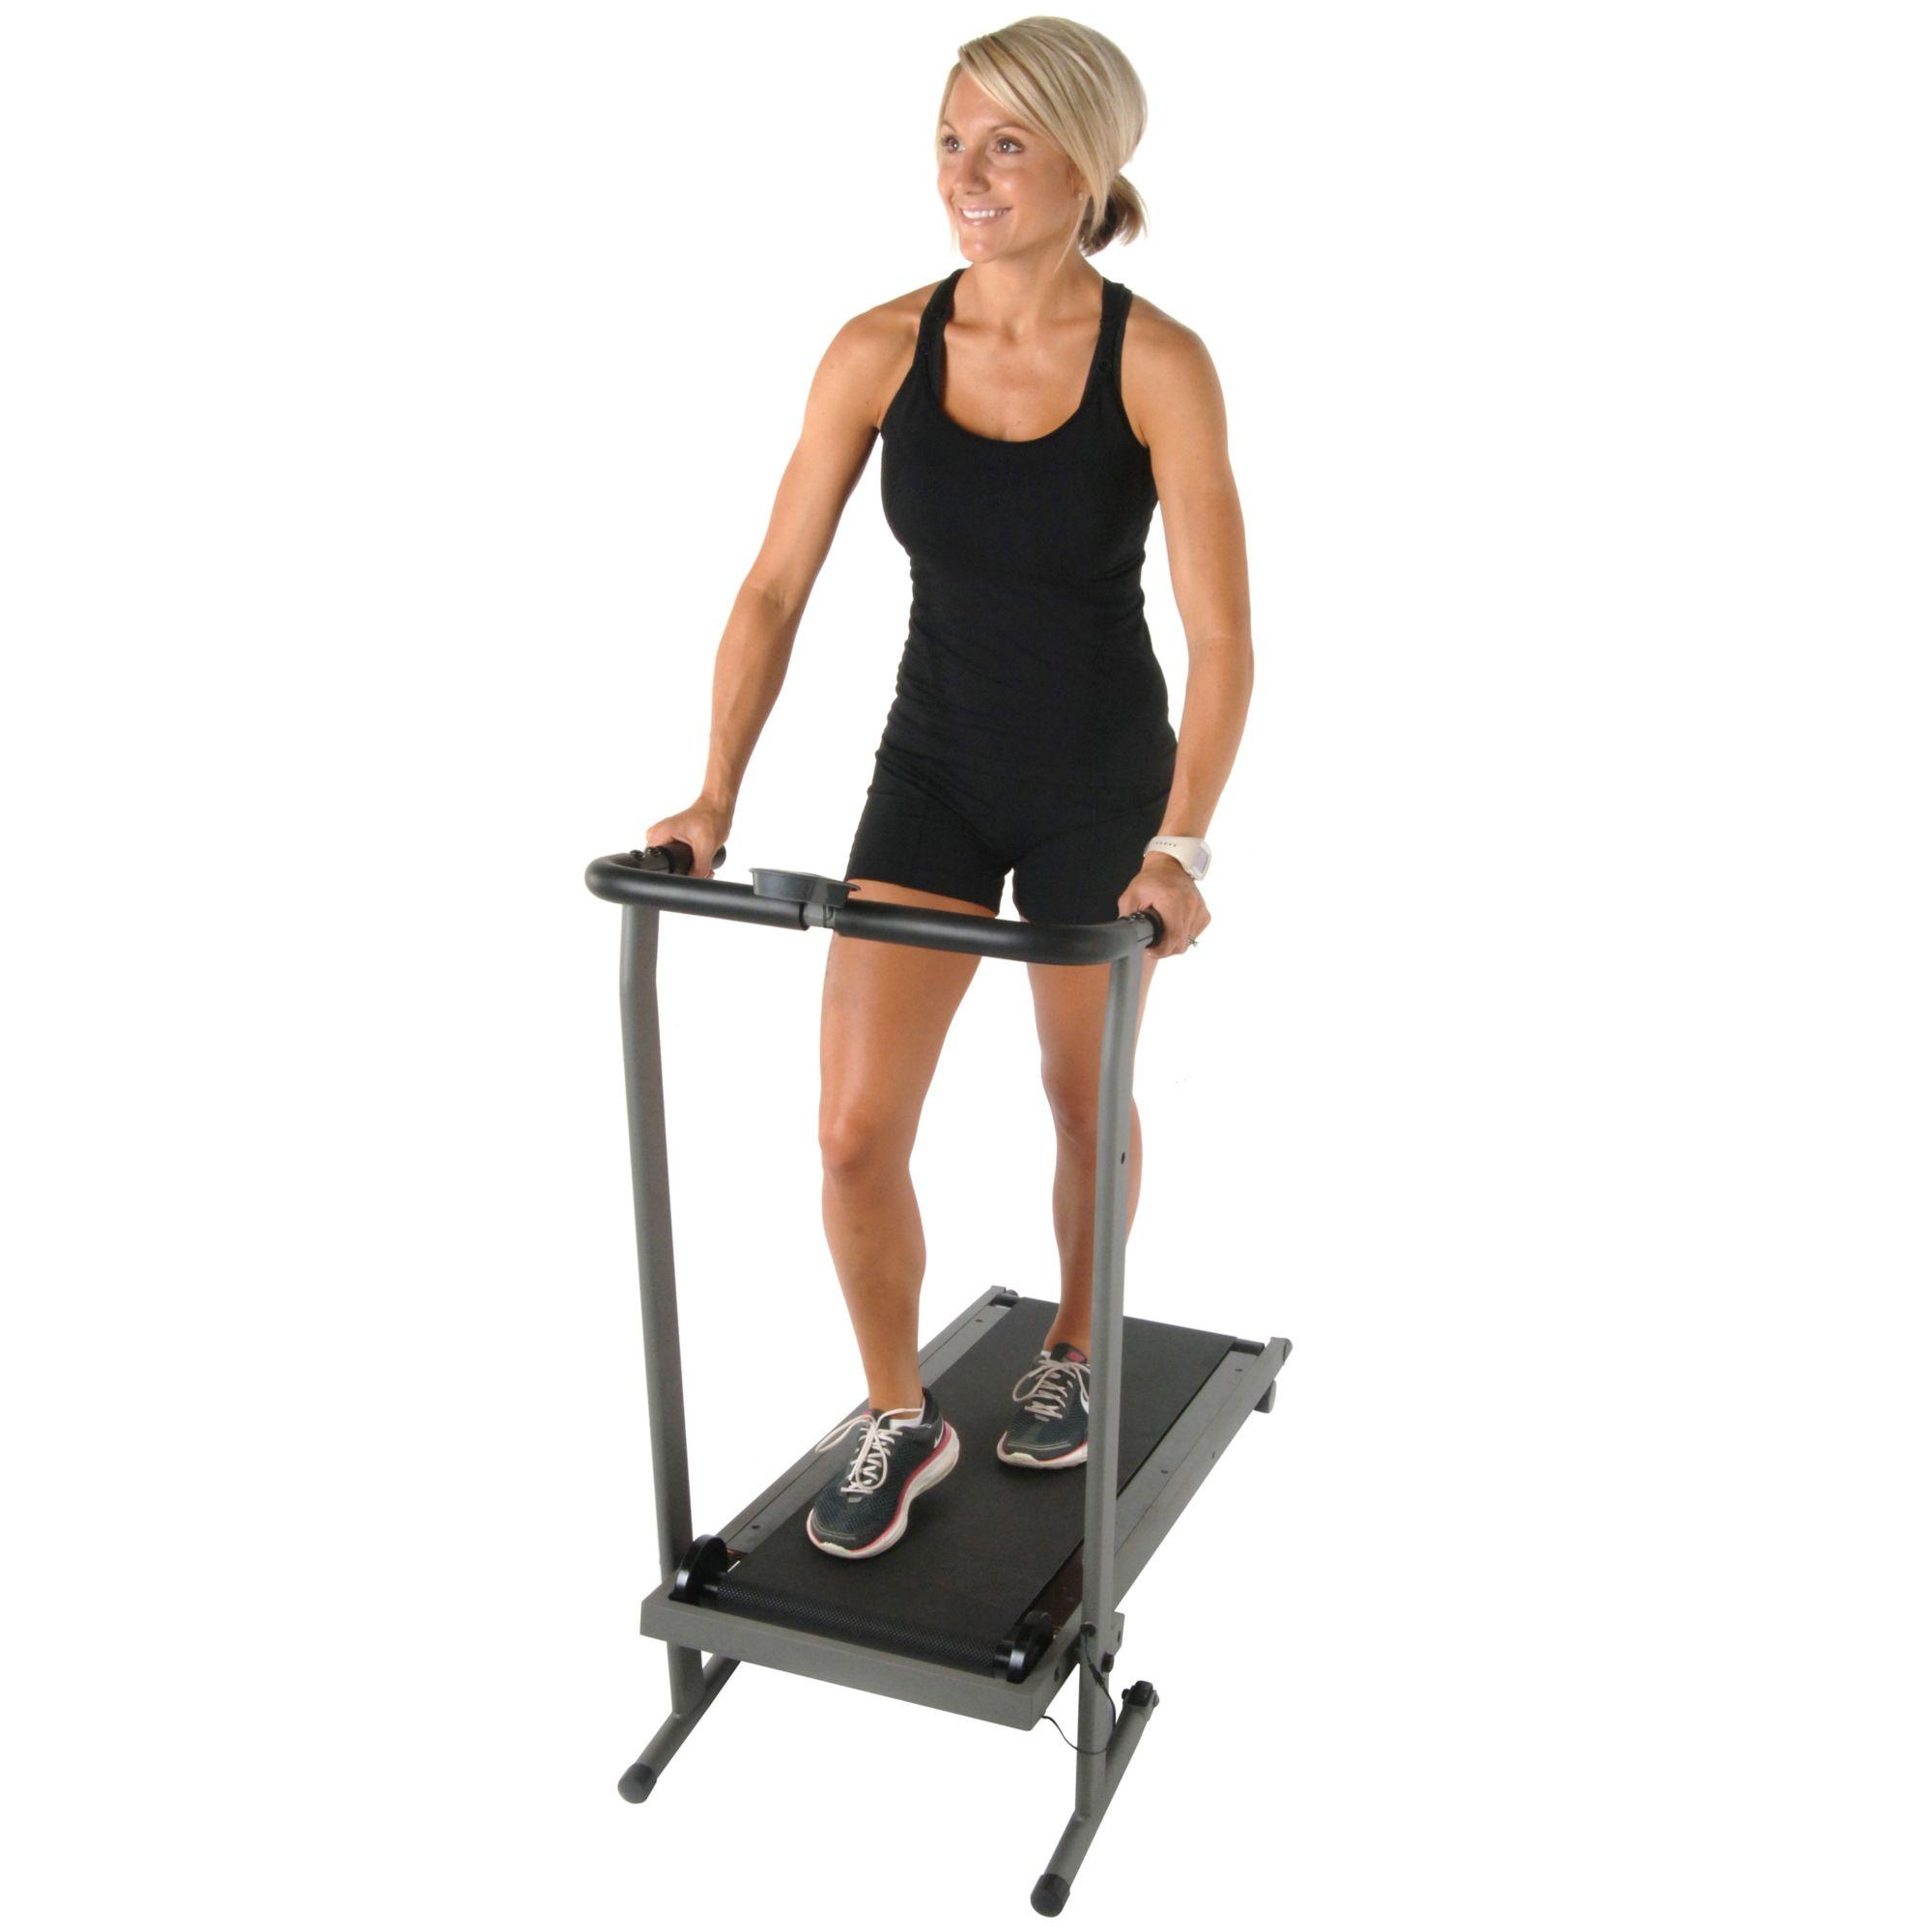 inmotion t900 manual treadmill dick s sporting goods rh dickssportinggoods com Folding Manual Treadmill Folding Manual Treadmill